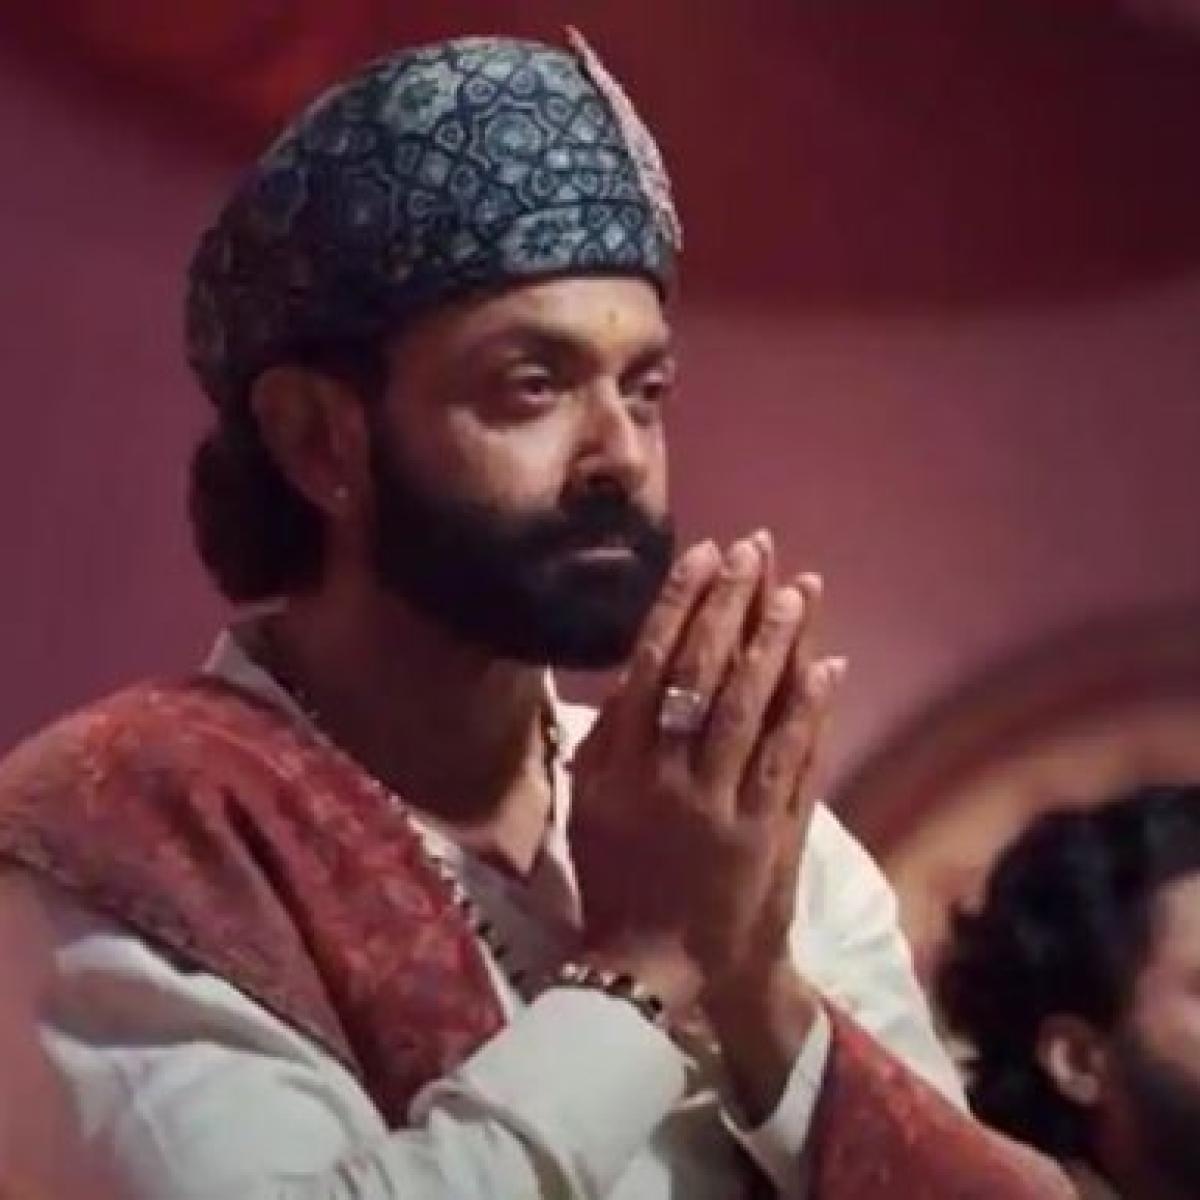 Rajasthan: FIR against Prakash Jha, Bobby Deol's web series 'Aashram' under SC/ST Act